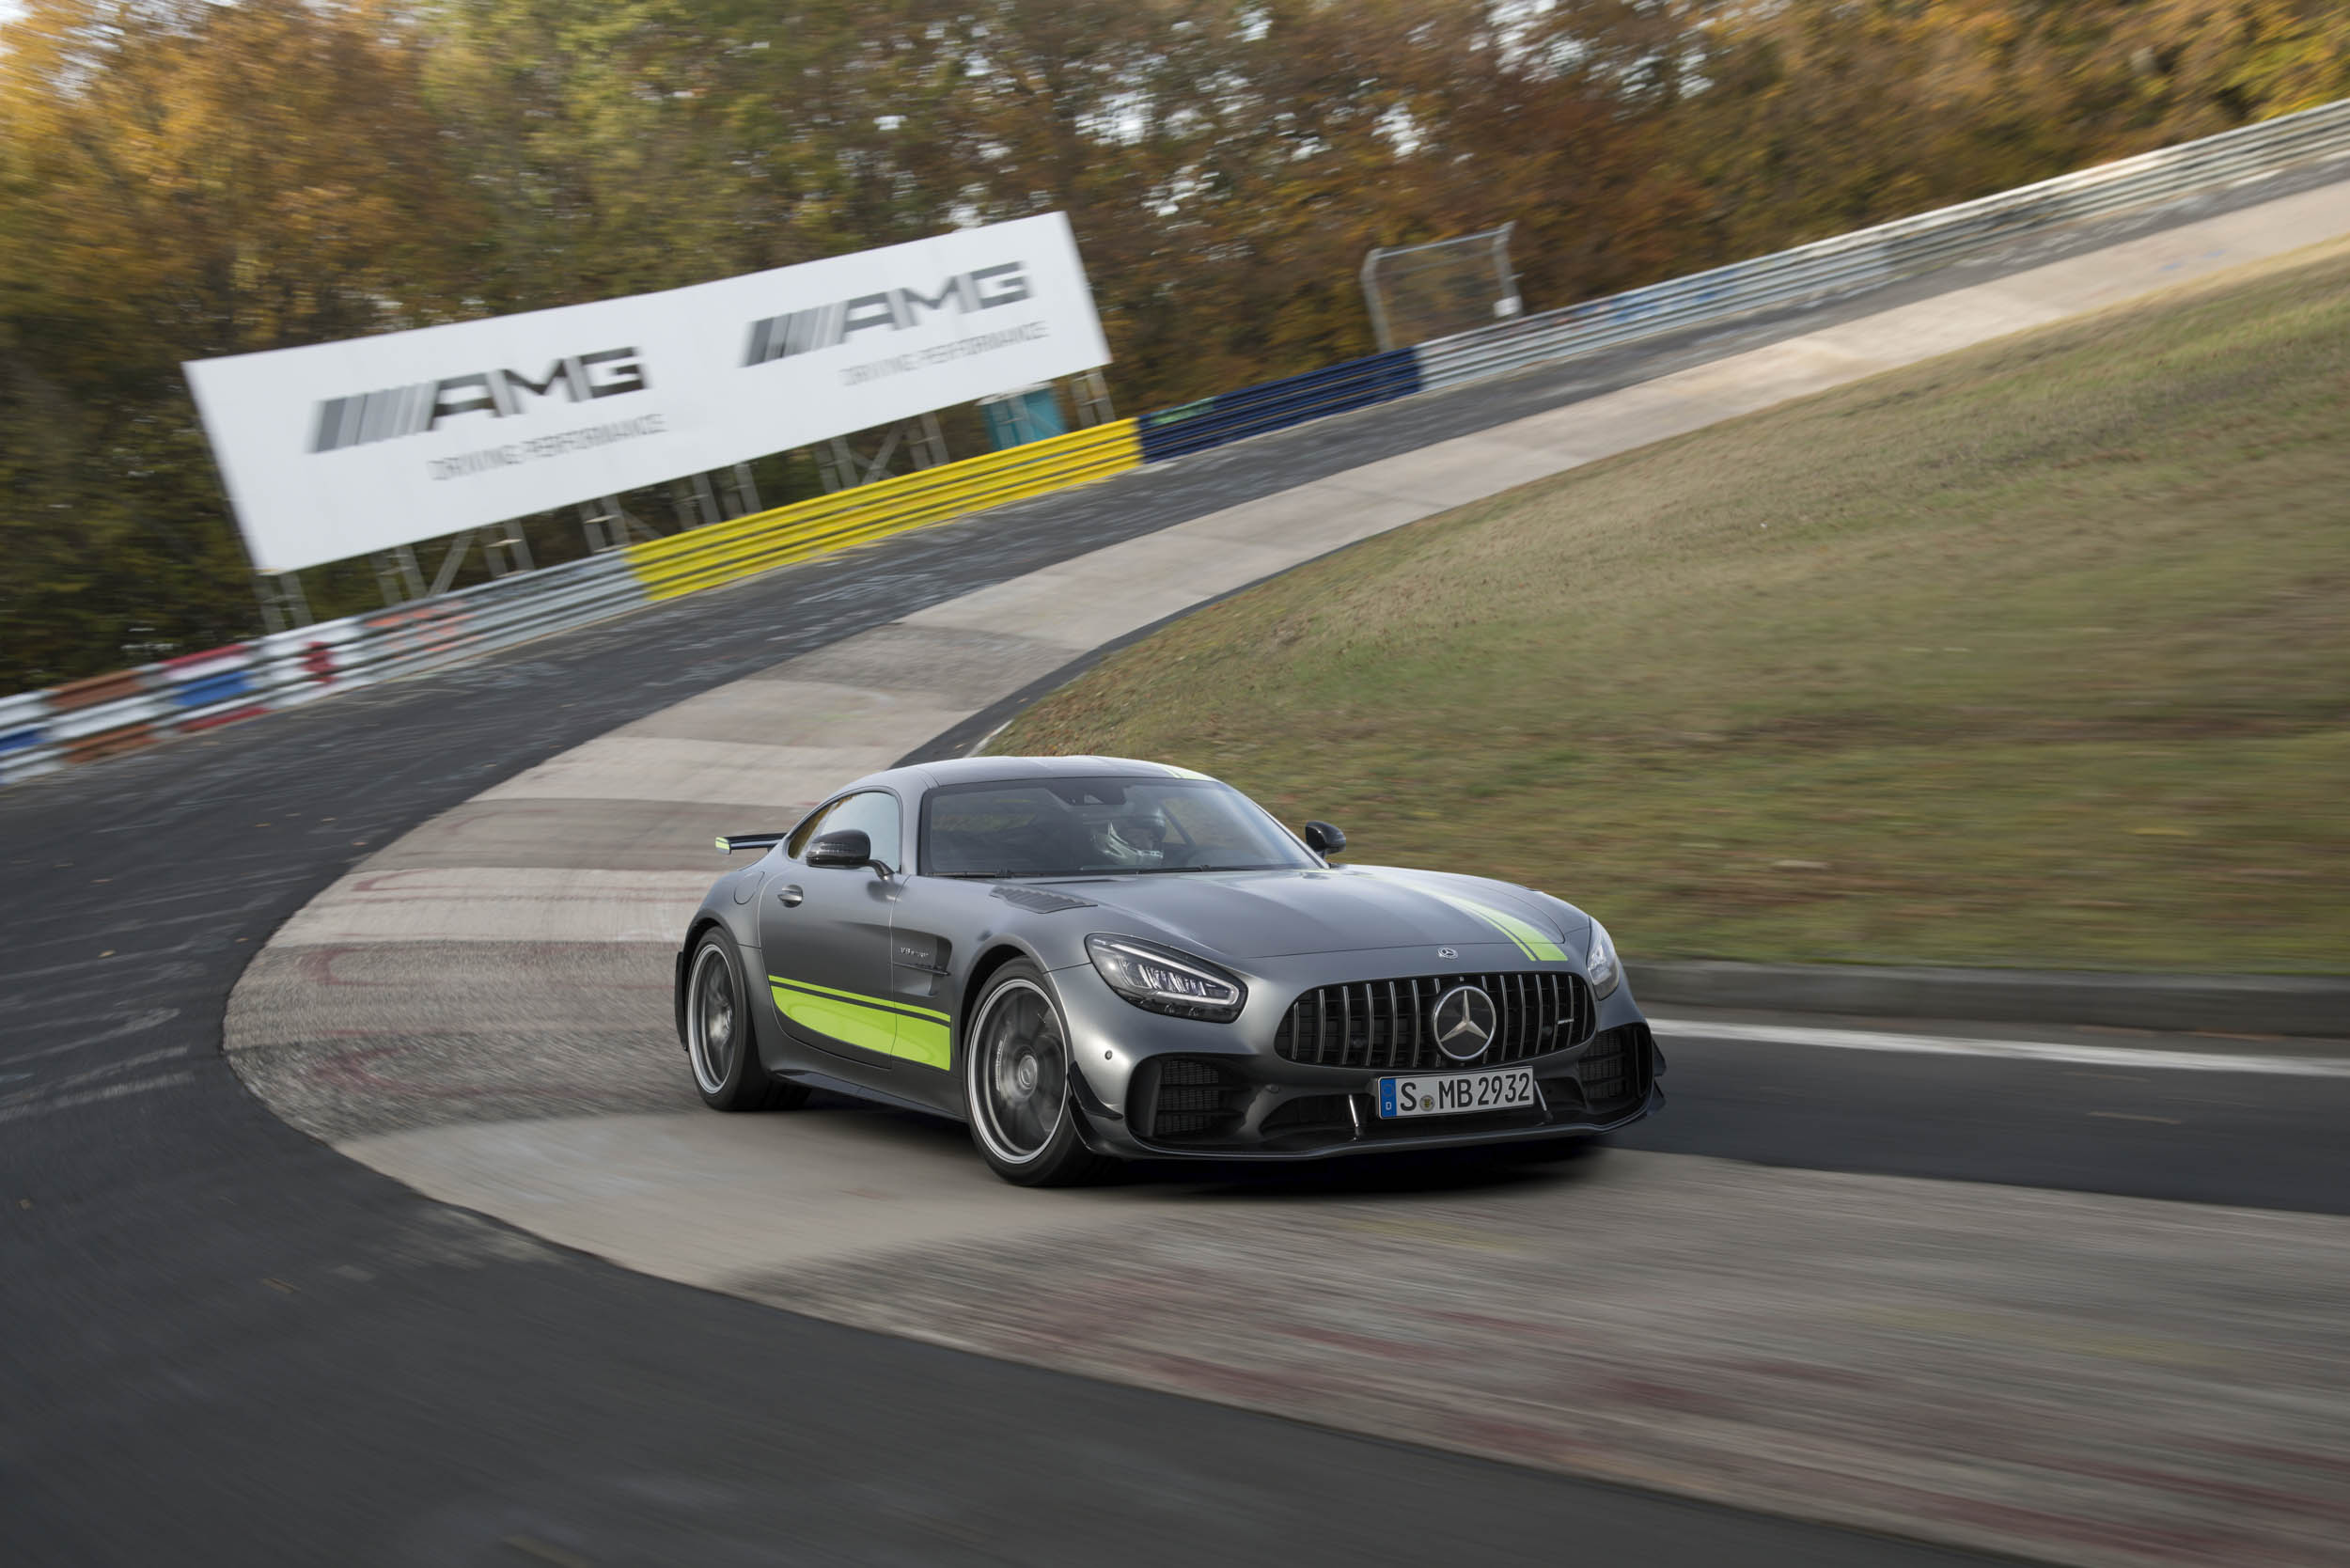 Mercedes-AMG GT R Pro banking left